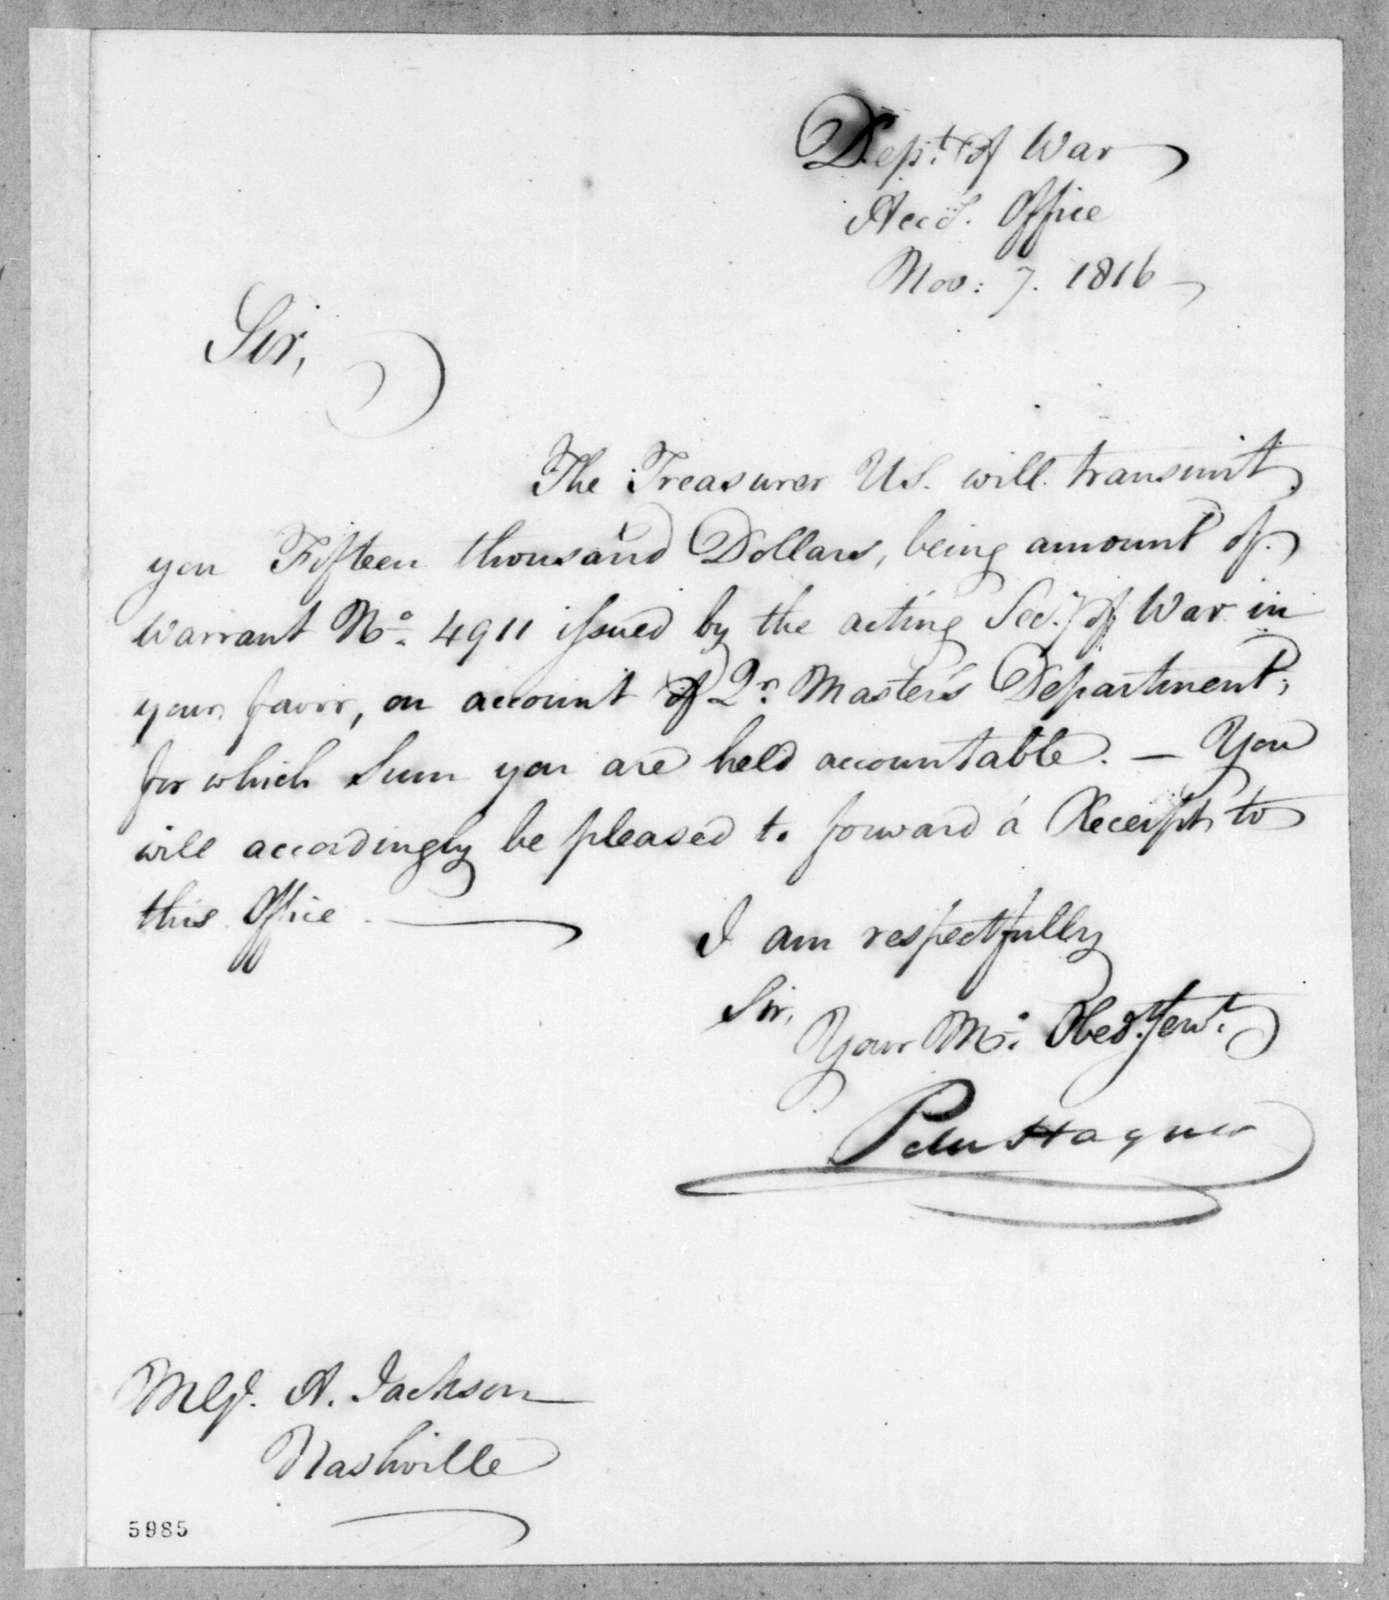 Peter Hagner to Andrew Jackson, November 7, 1816